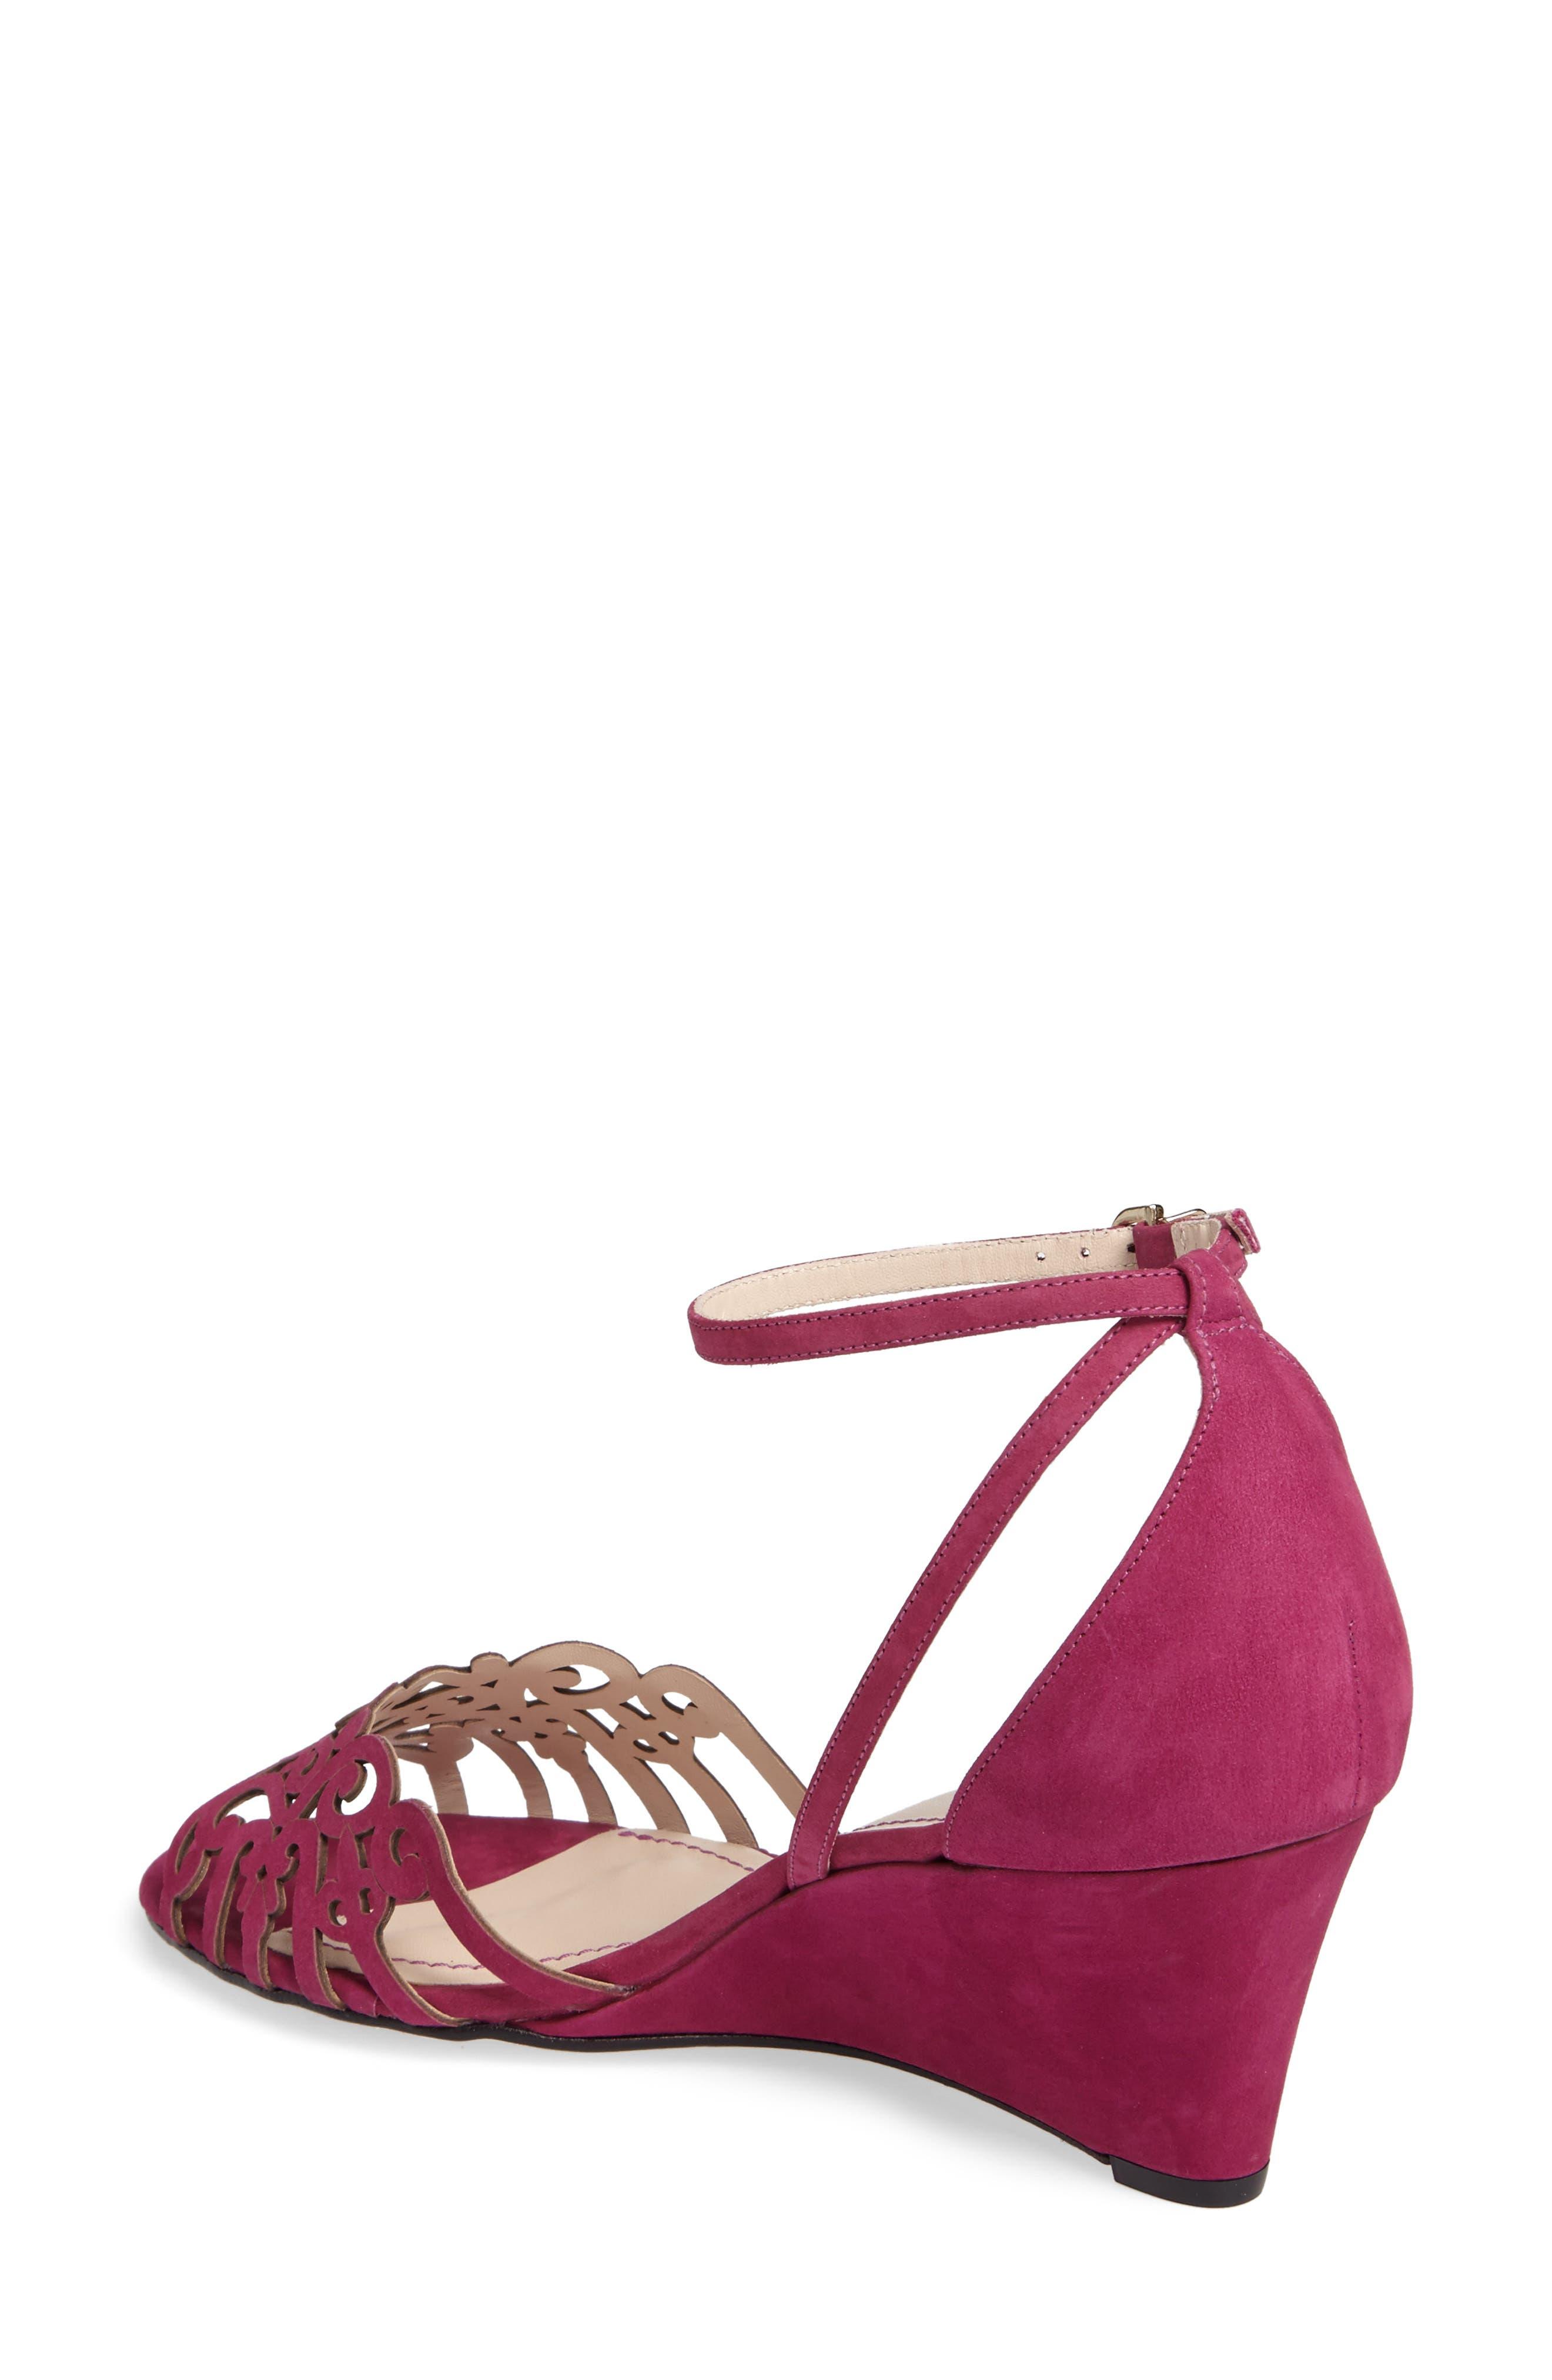 'Kingston' Ankle Strap Wedge Sandal,                             Alternate thumbnail 2, color,                             MAGENTA LEATHER